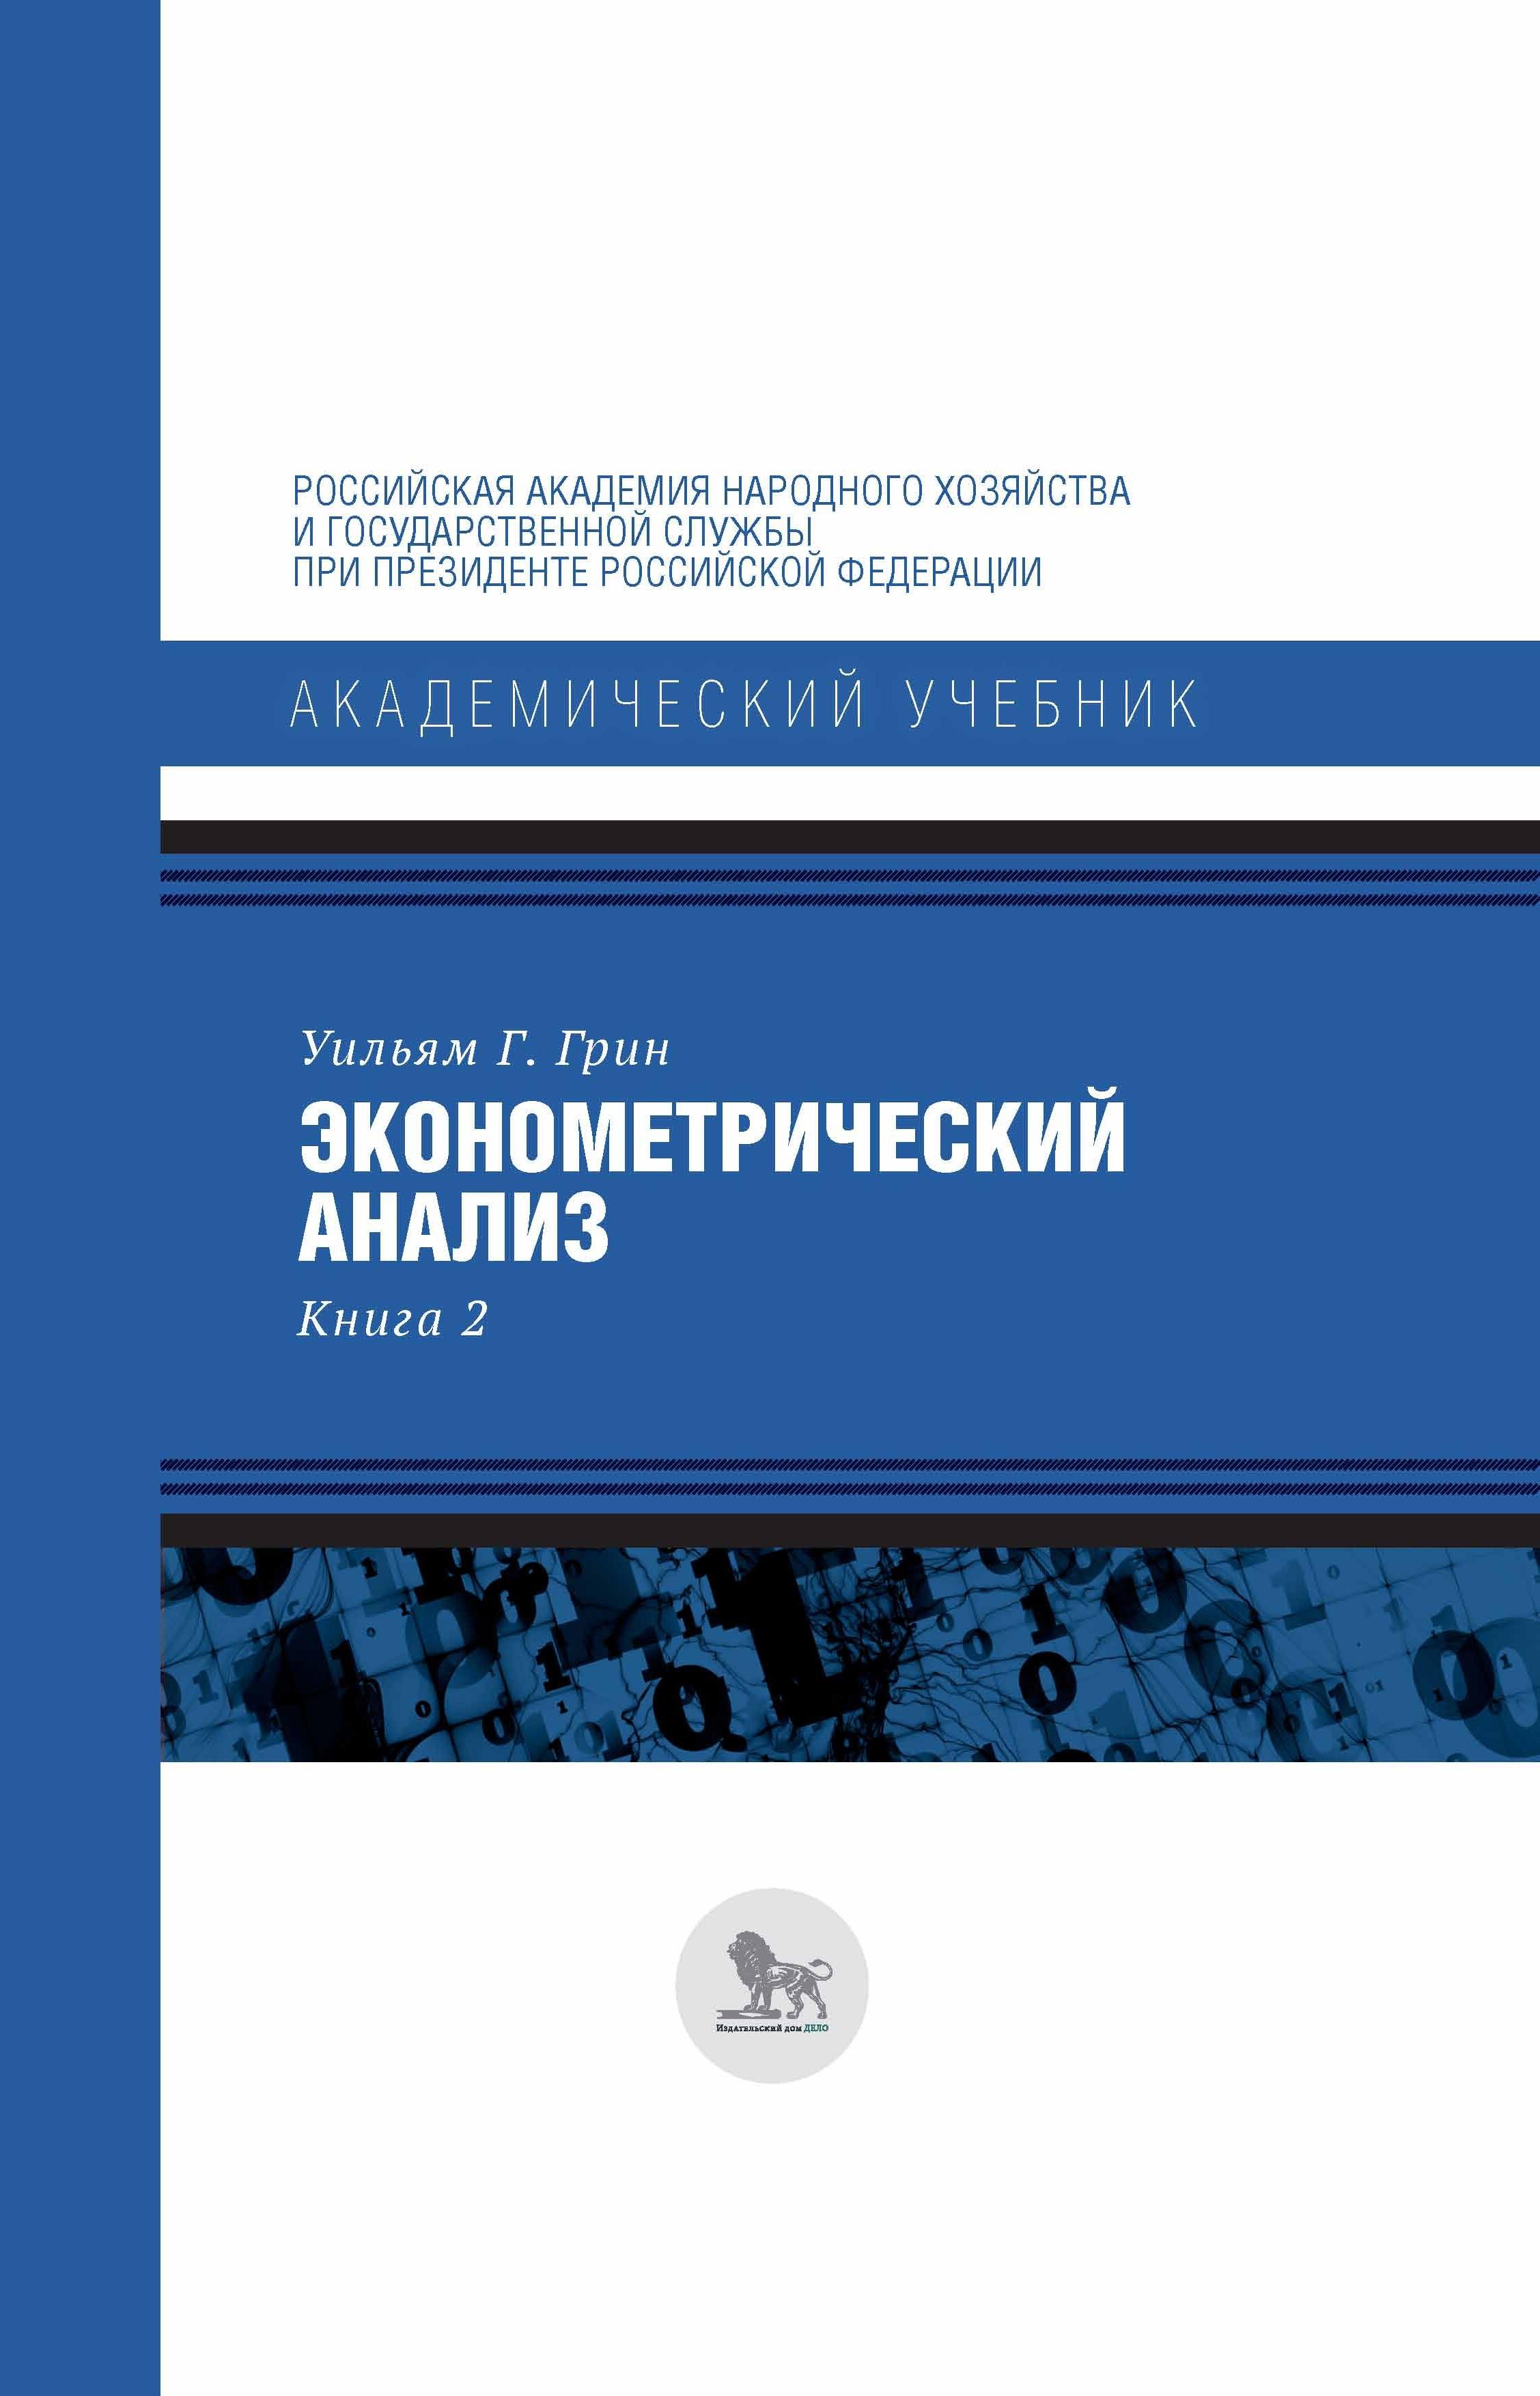 Уильям Г. Грин Эконометрический анализ. Книга 2 уильям грин эконометрический анализ книга 2